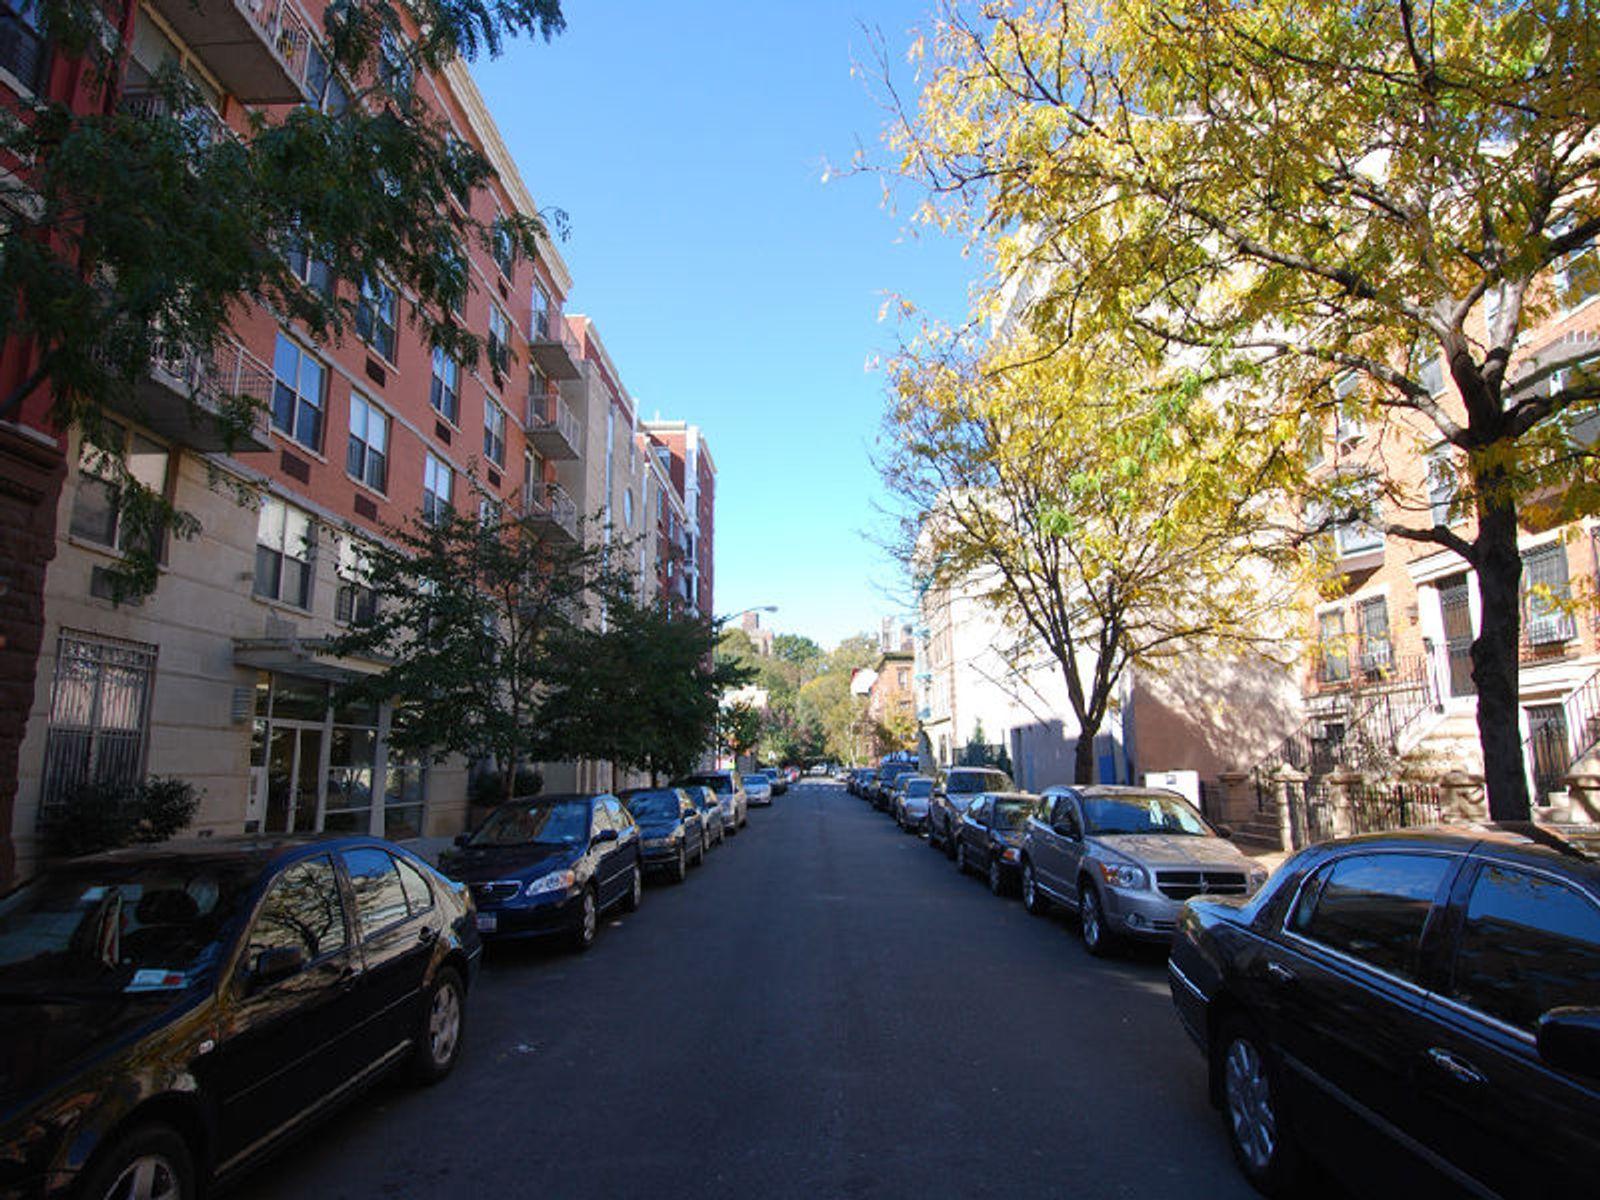 310 West 120th Street, PH8A